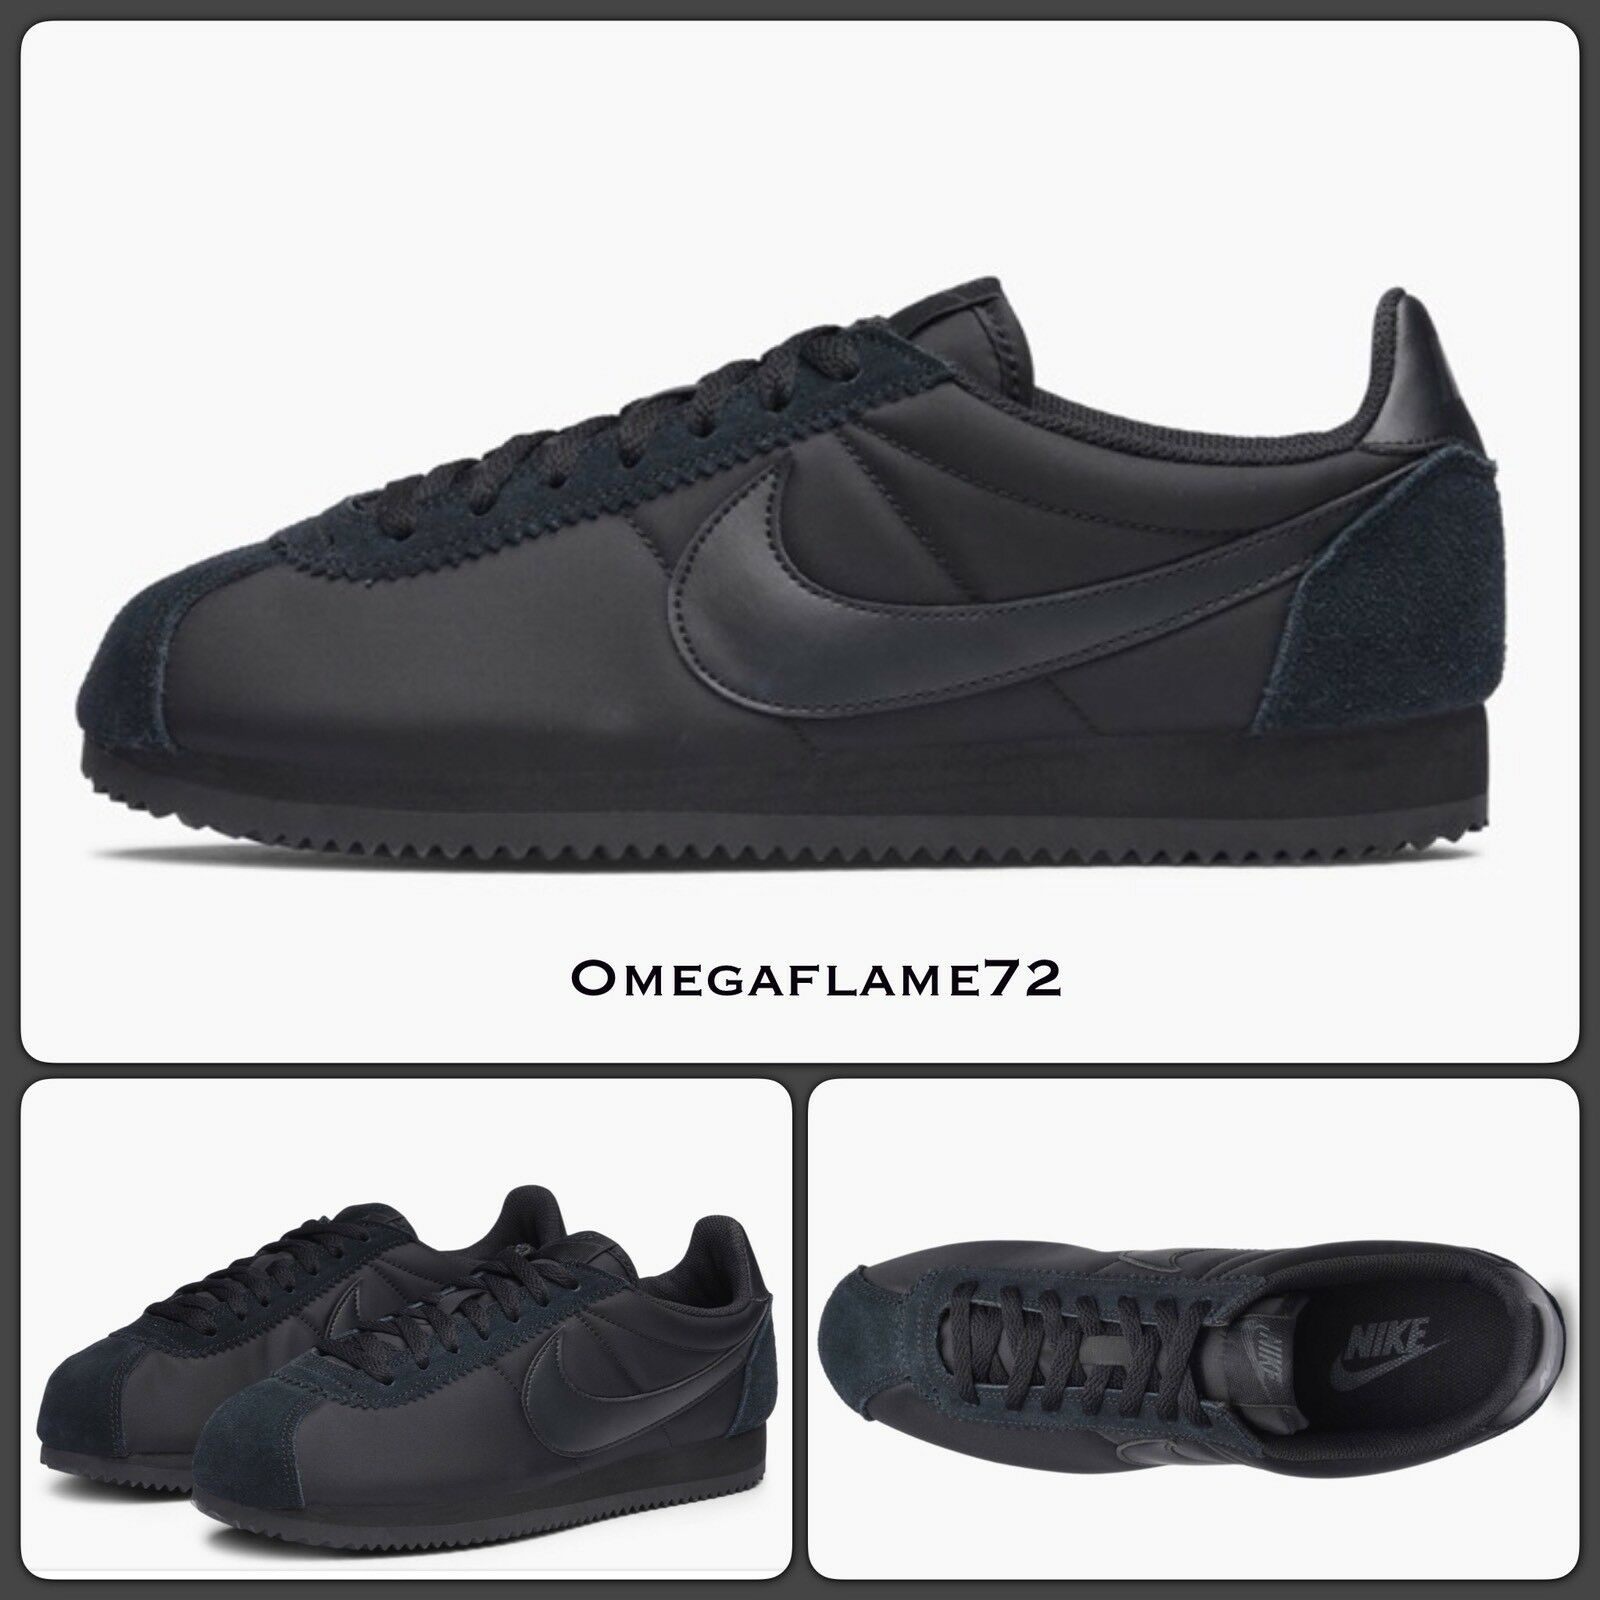 Nike cortez nylon og, triple nero, 749864-003